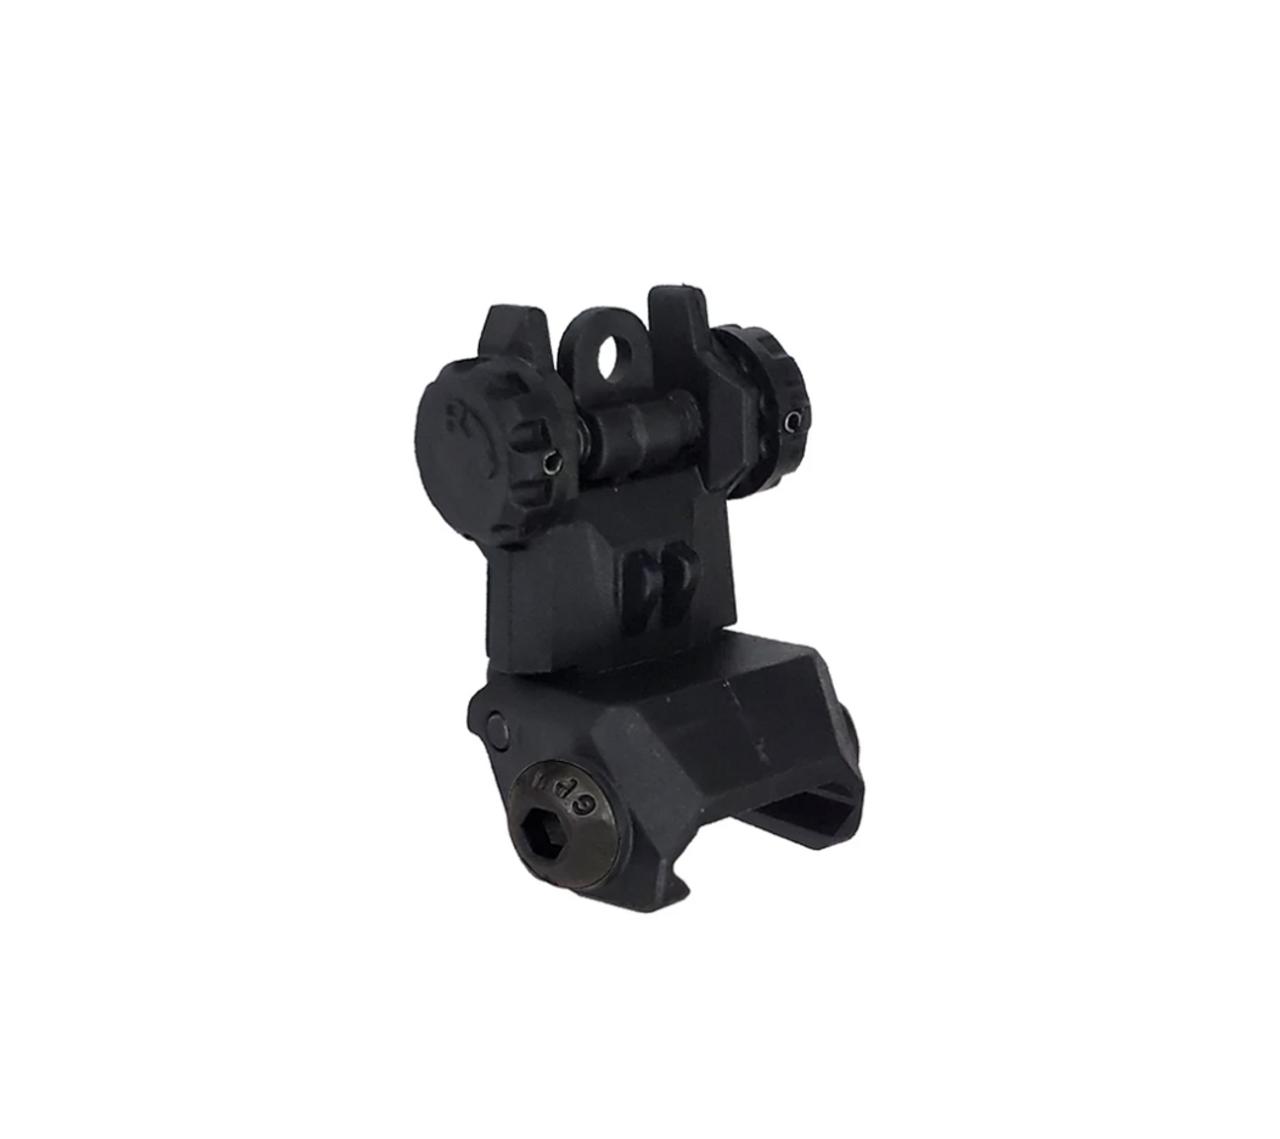 Polymer Rear Flip-up Sight XTS-FRS